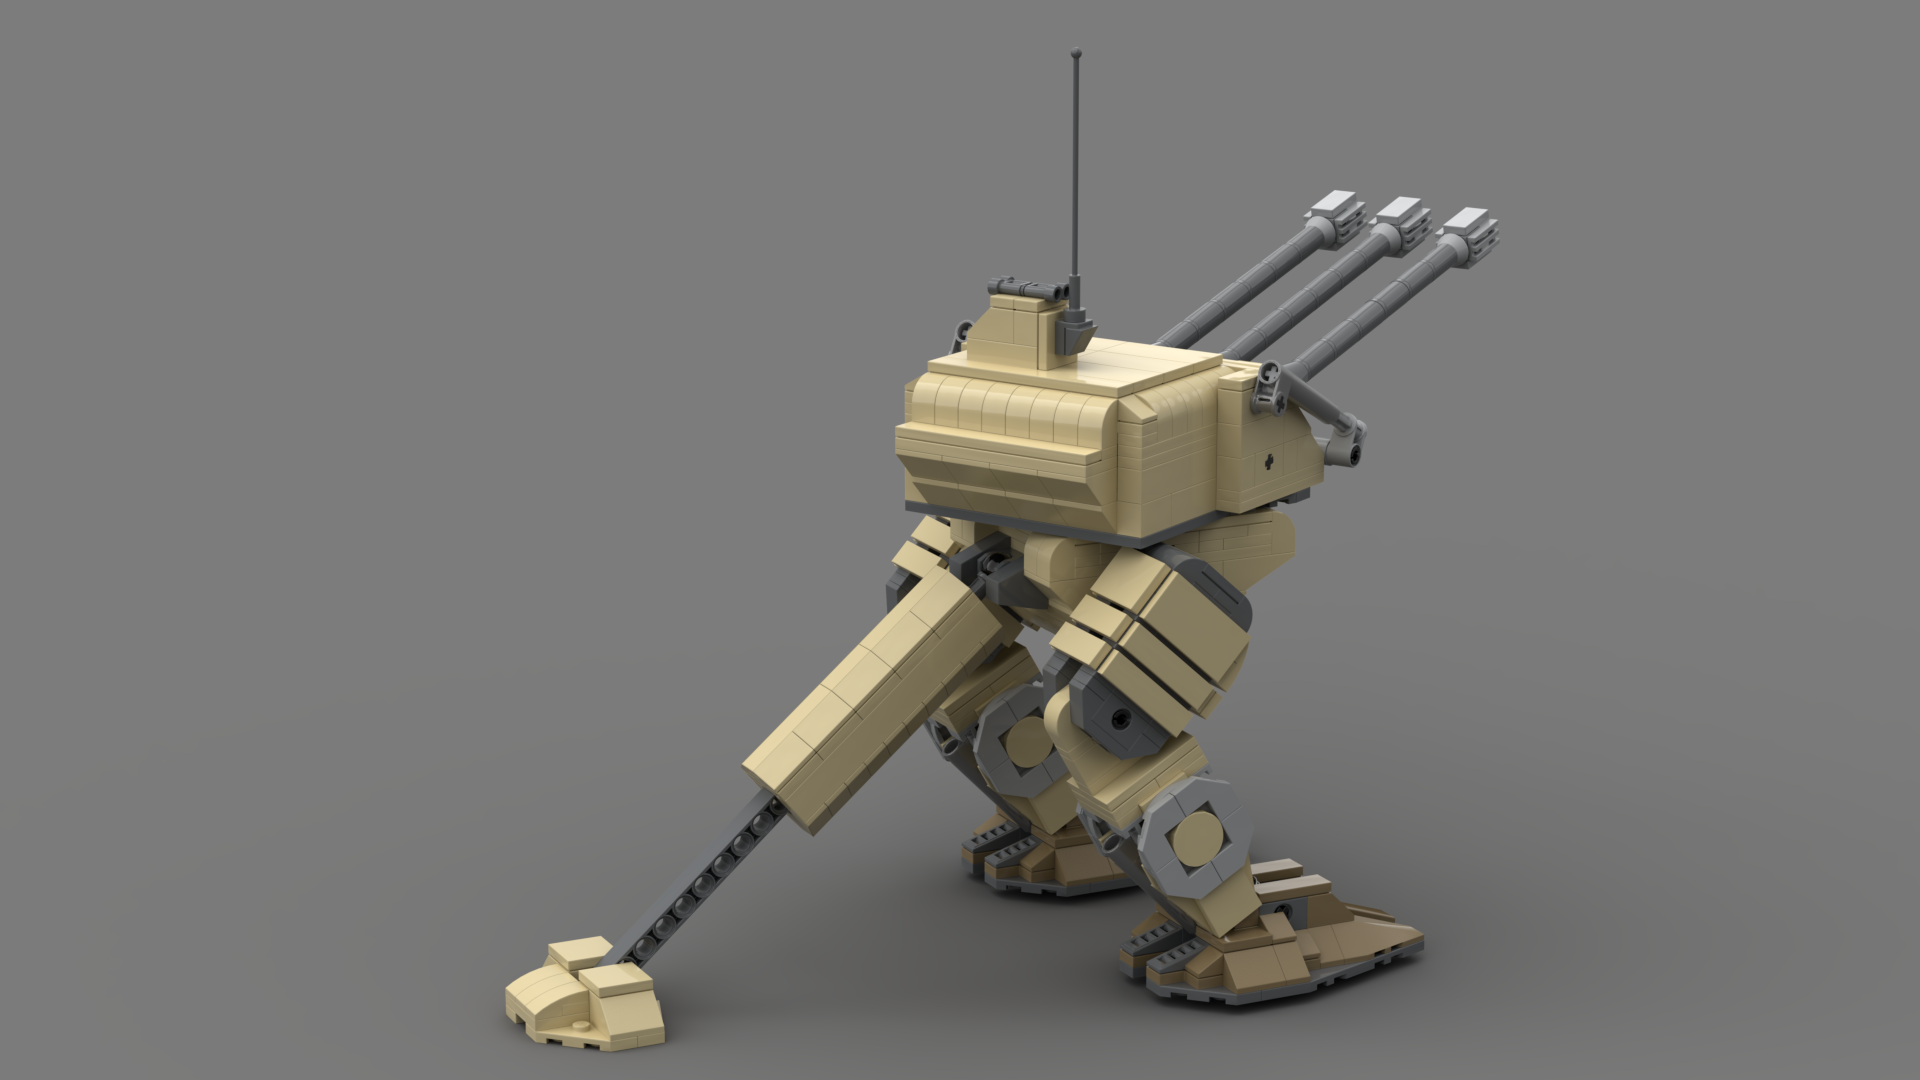 Juggernaut Mk 1 Lego Halo Lego Military Lego